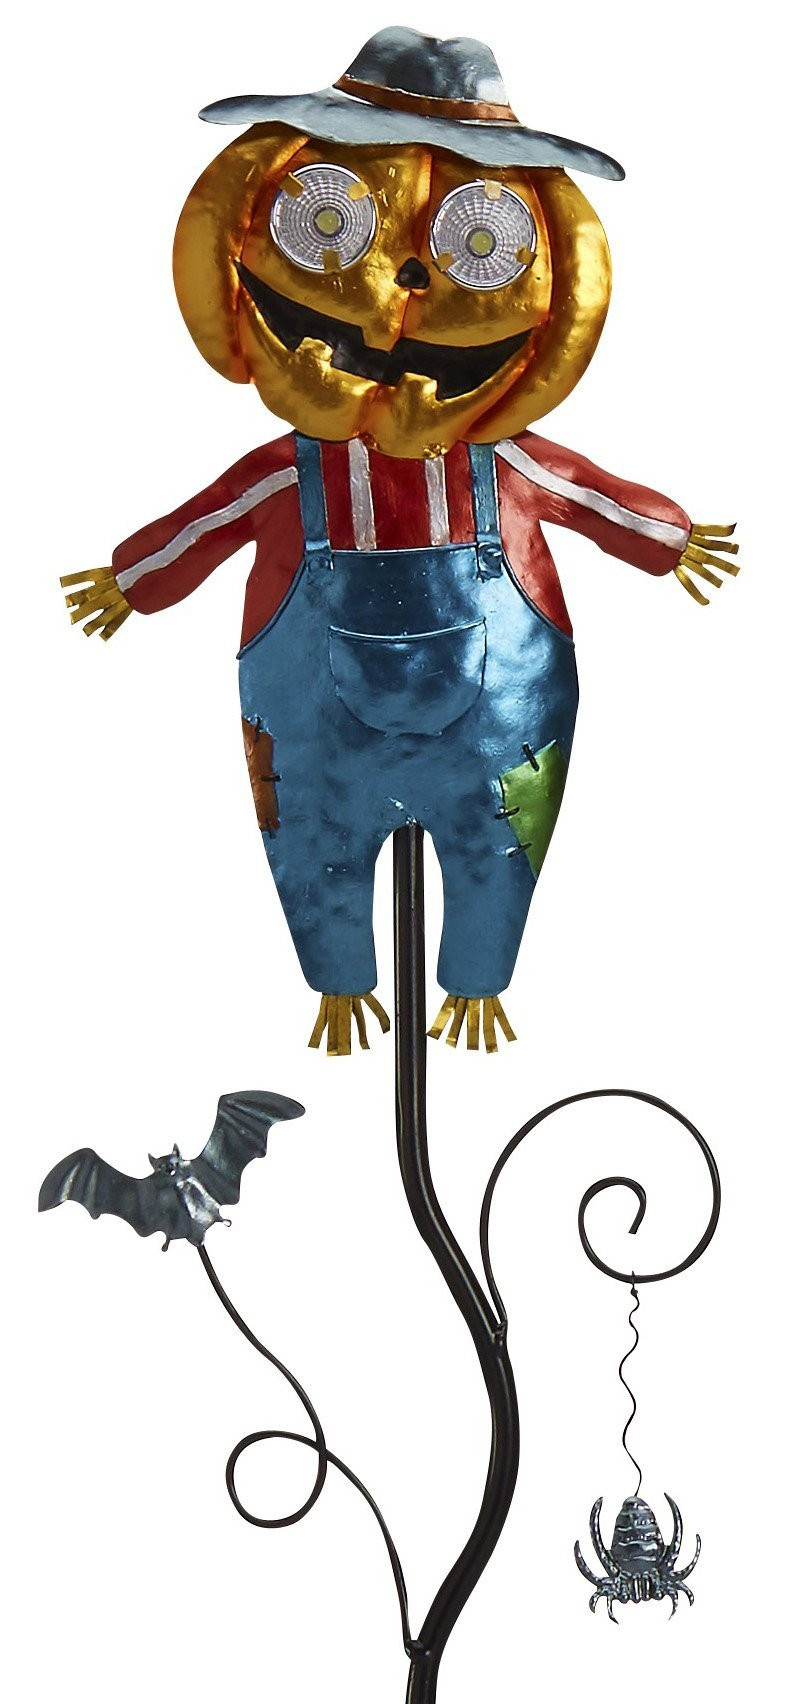 Goblin Guiders - Solar Powered Halloween Decorative Lights - Jolly Pumpkin Scarecrow